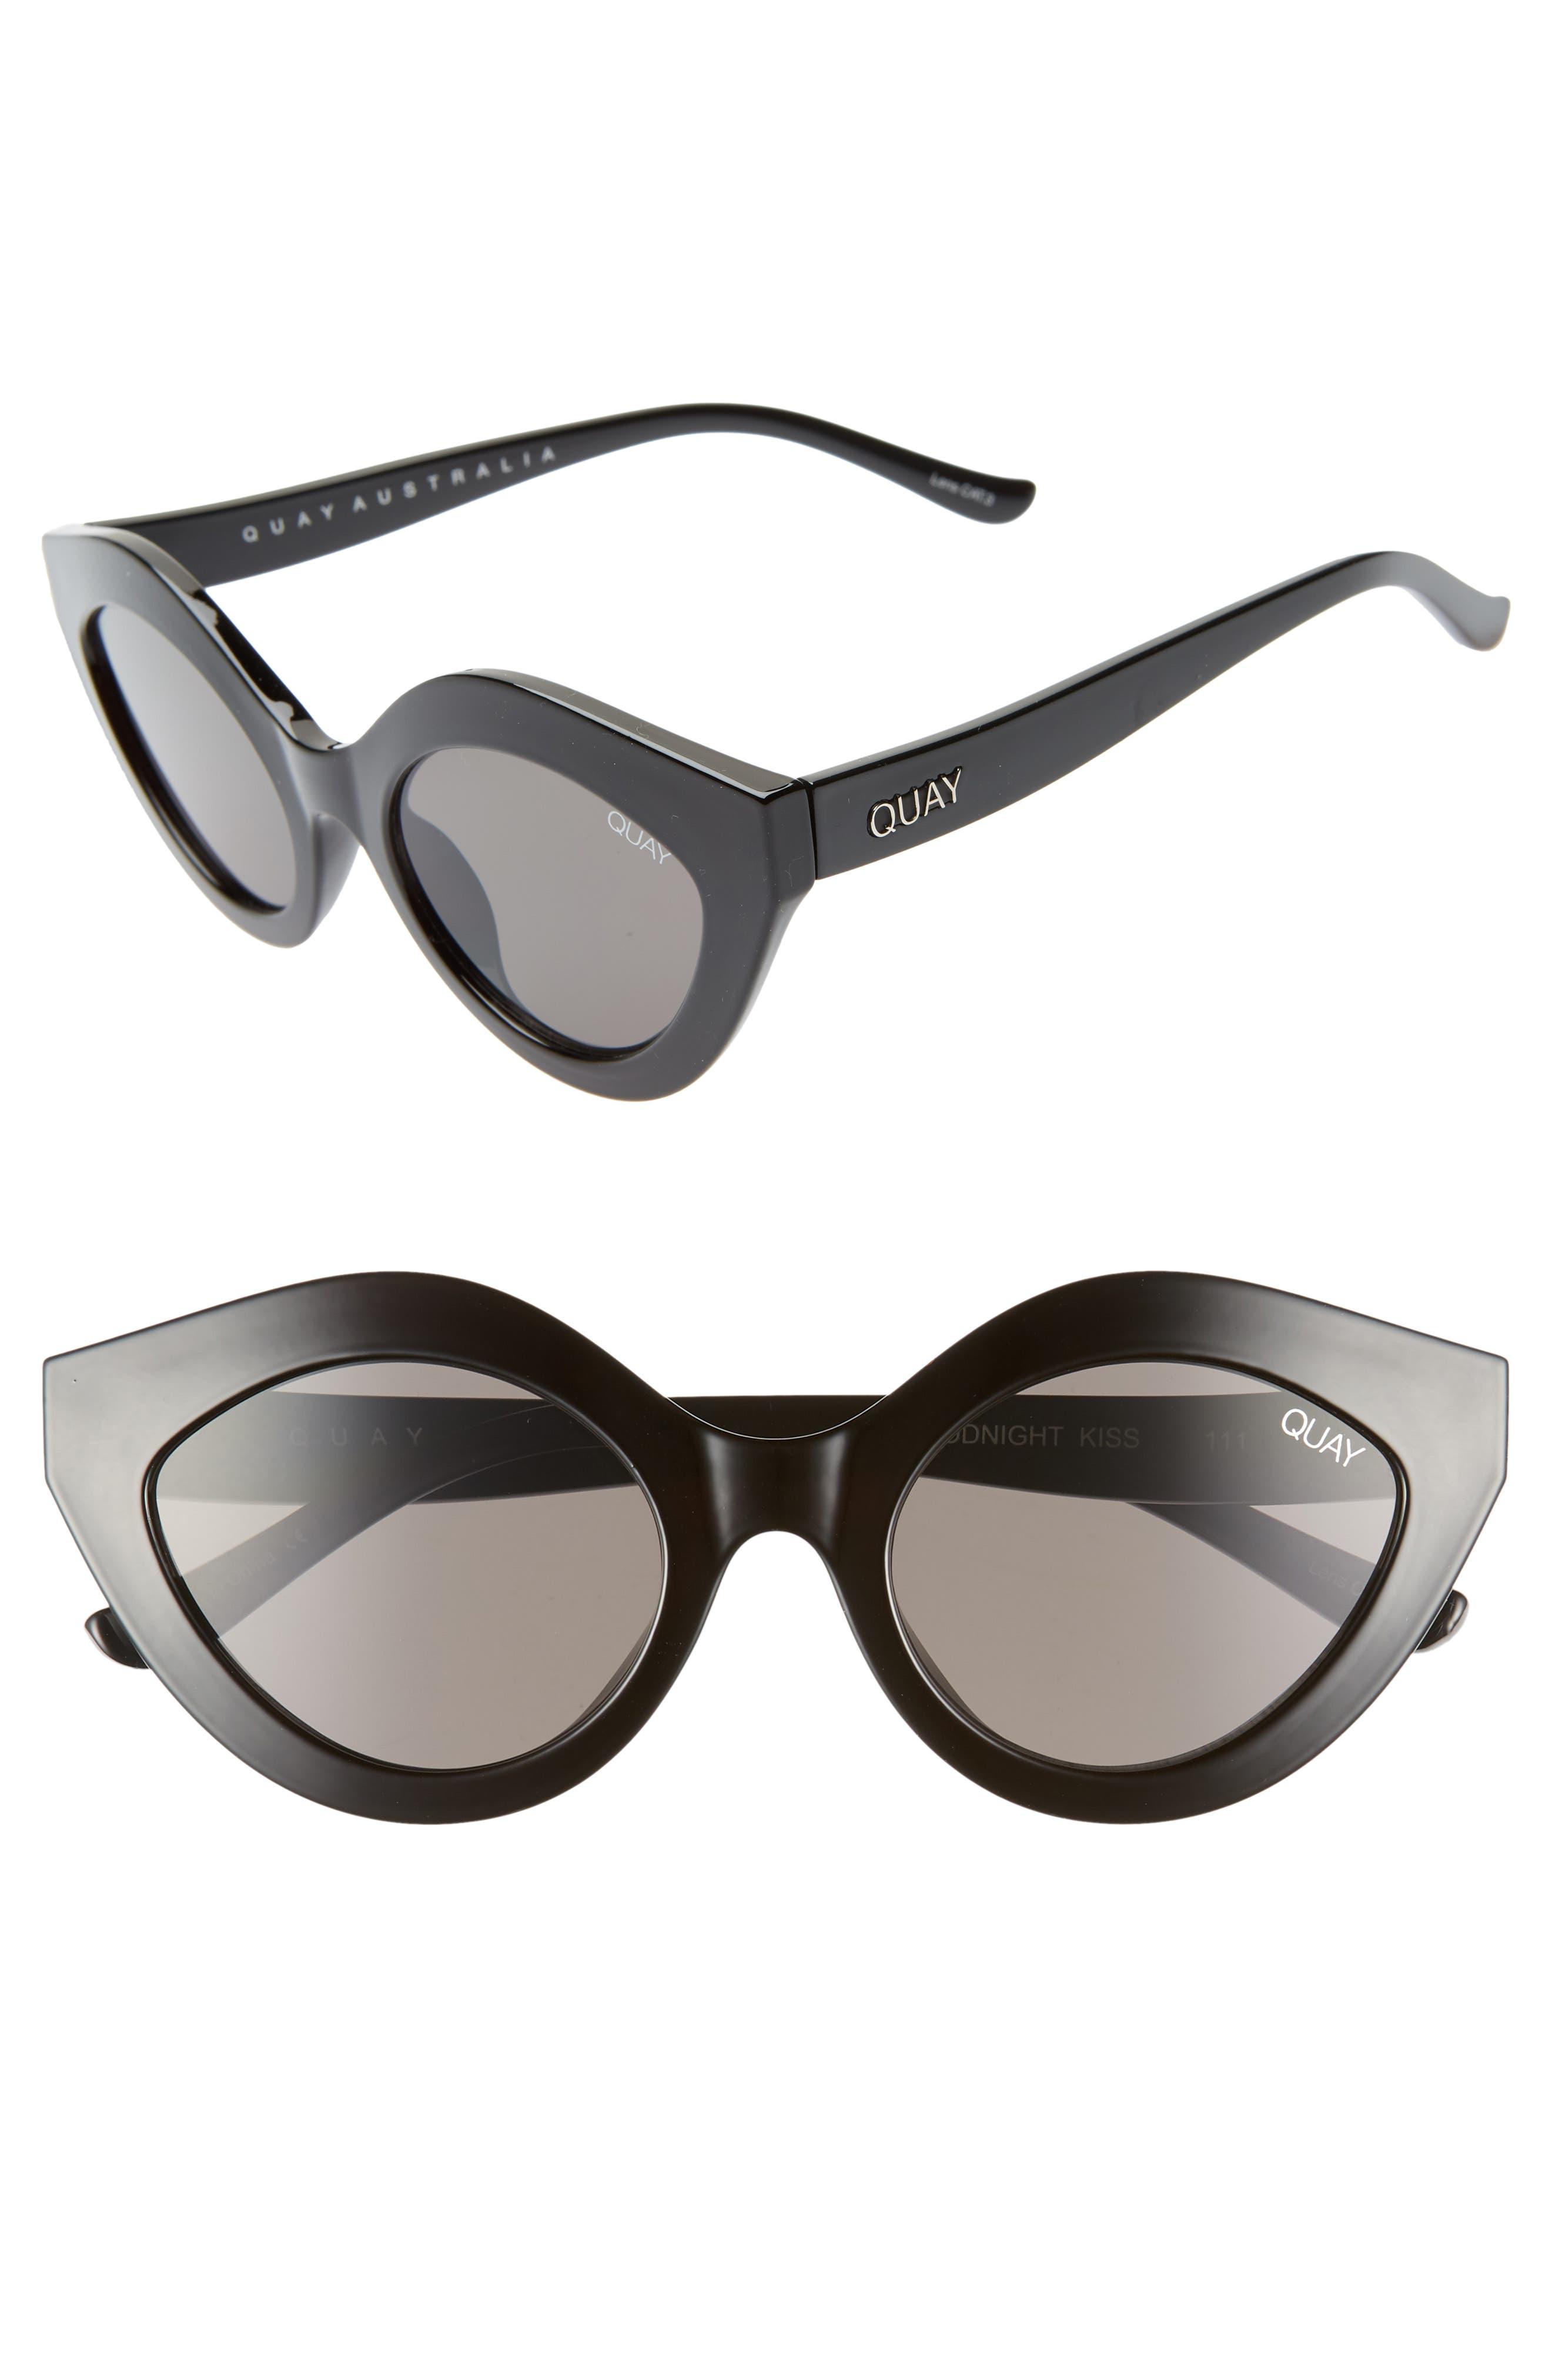 QUAY AUSTRALIA, Goodnight Kiss Cat Eye Sunglasses, Main thumbnail 1, color, BLACK / SMOKE